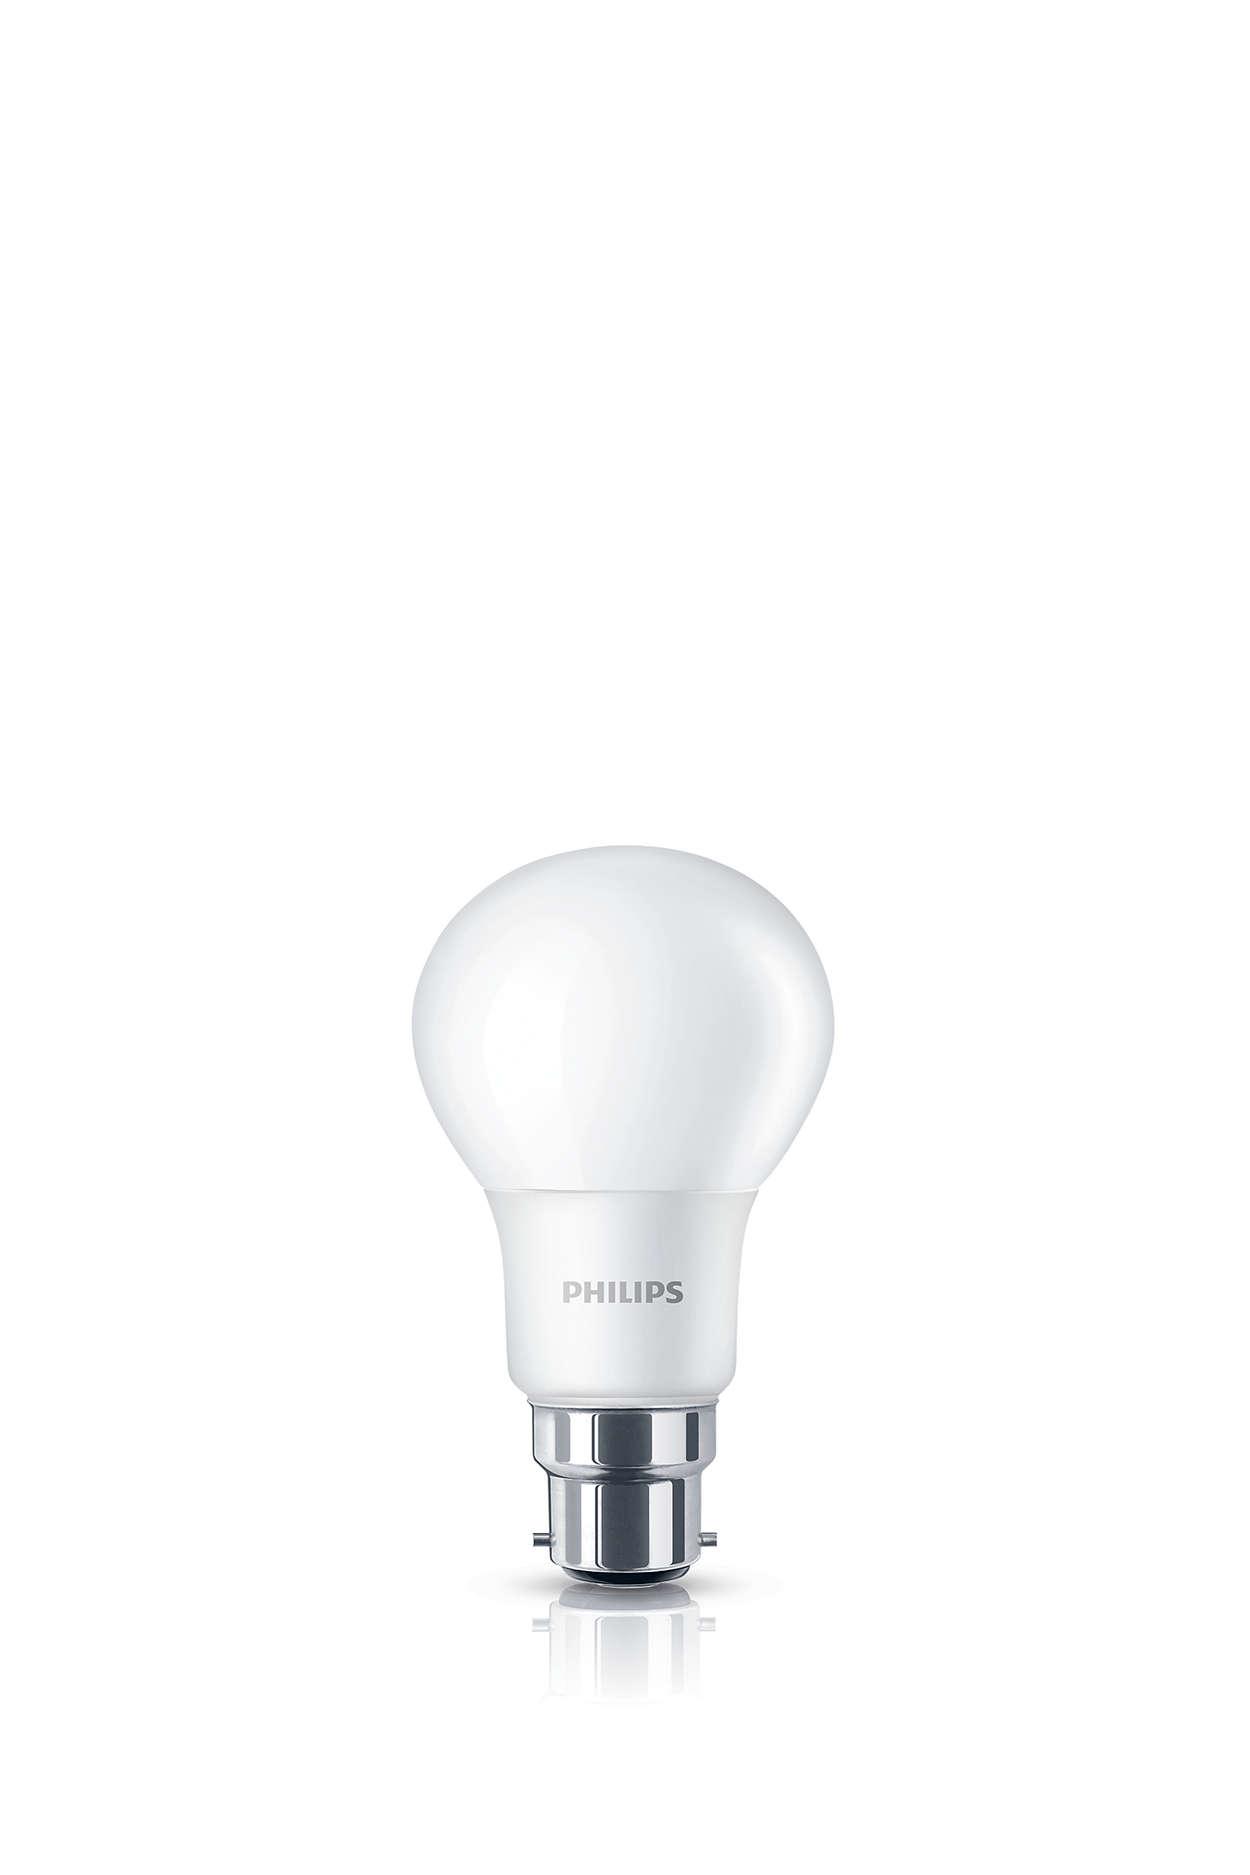 Upplev varmvitt LED-ljus